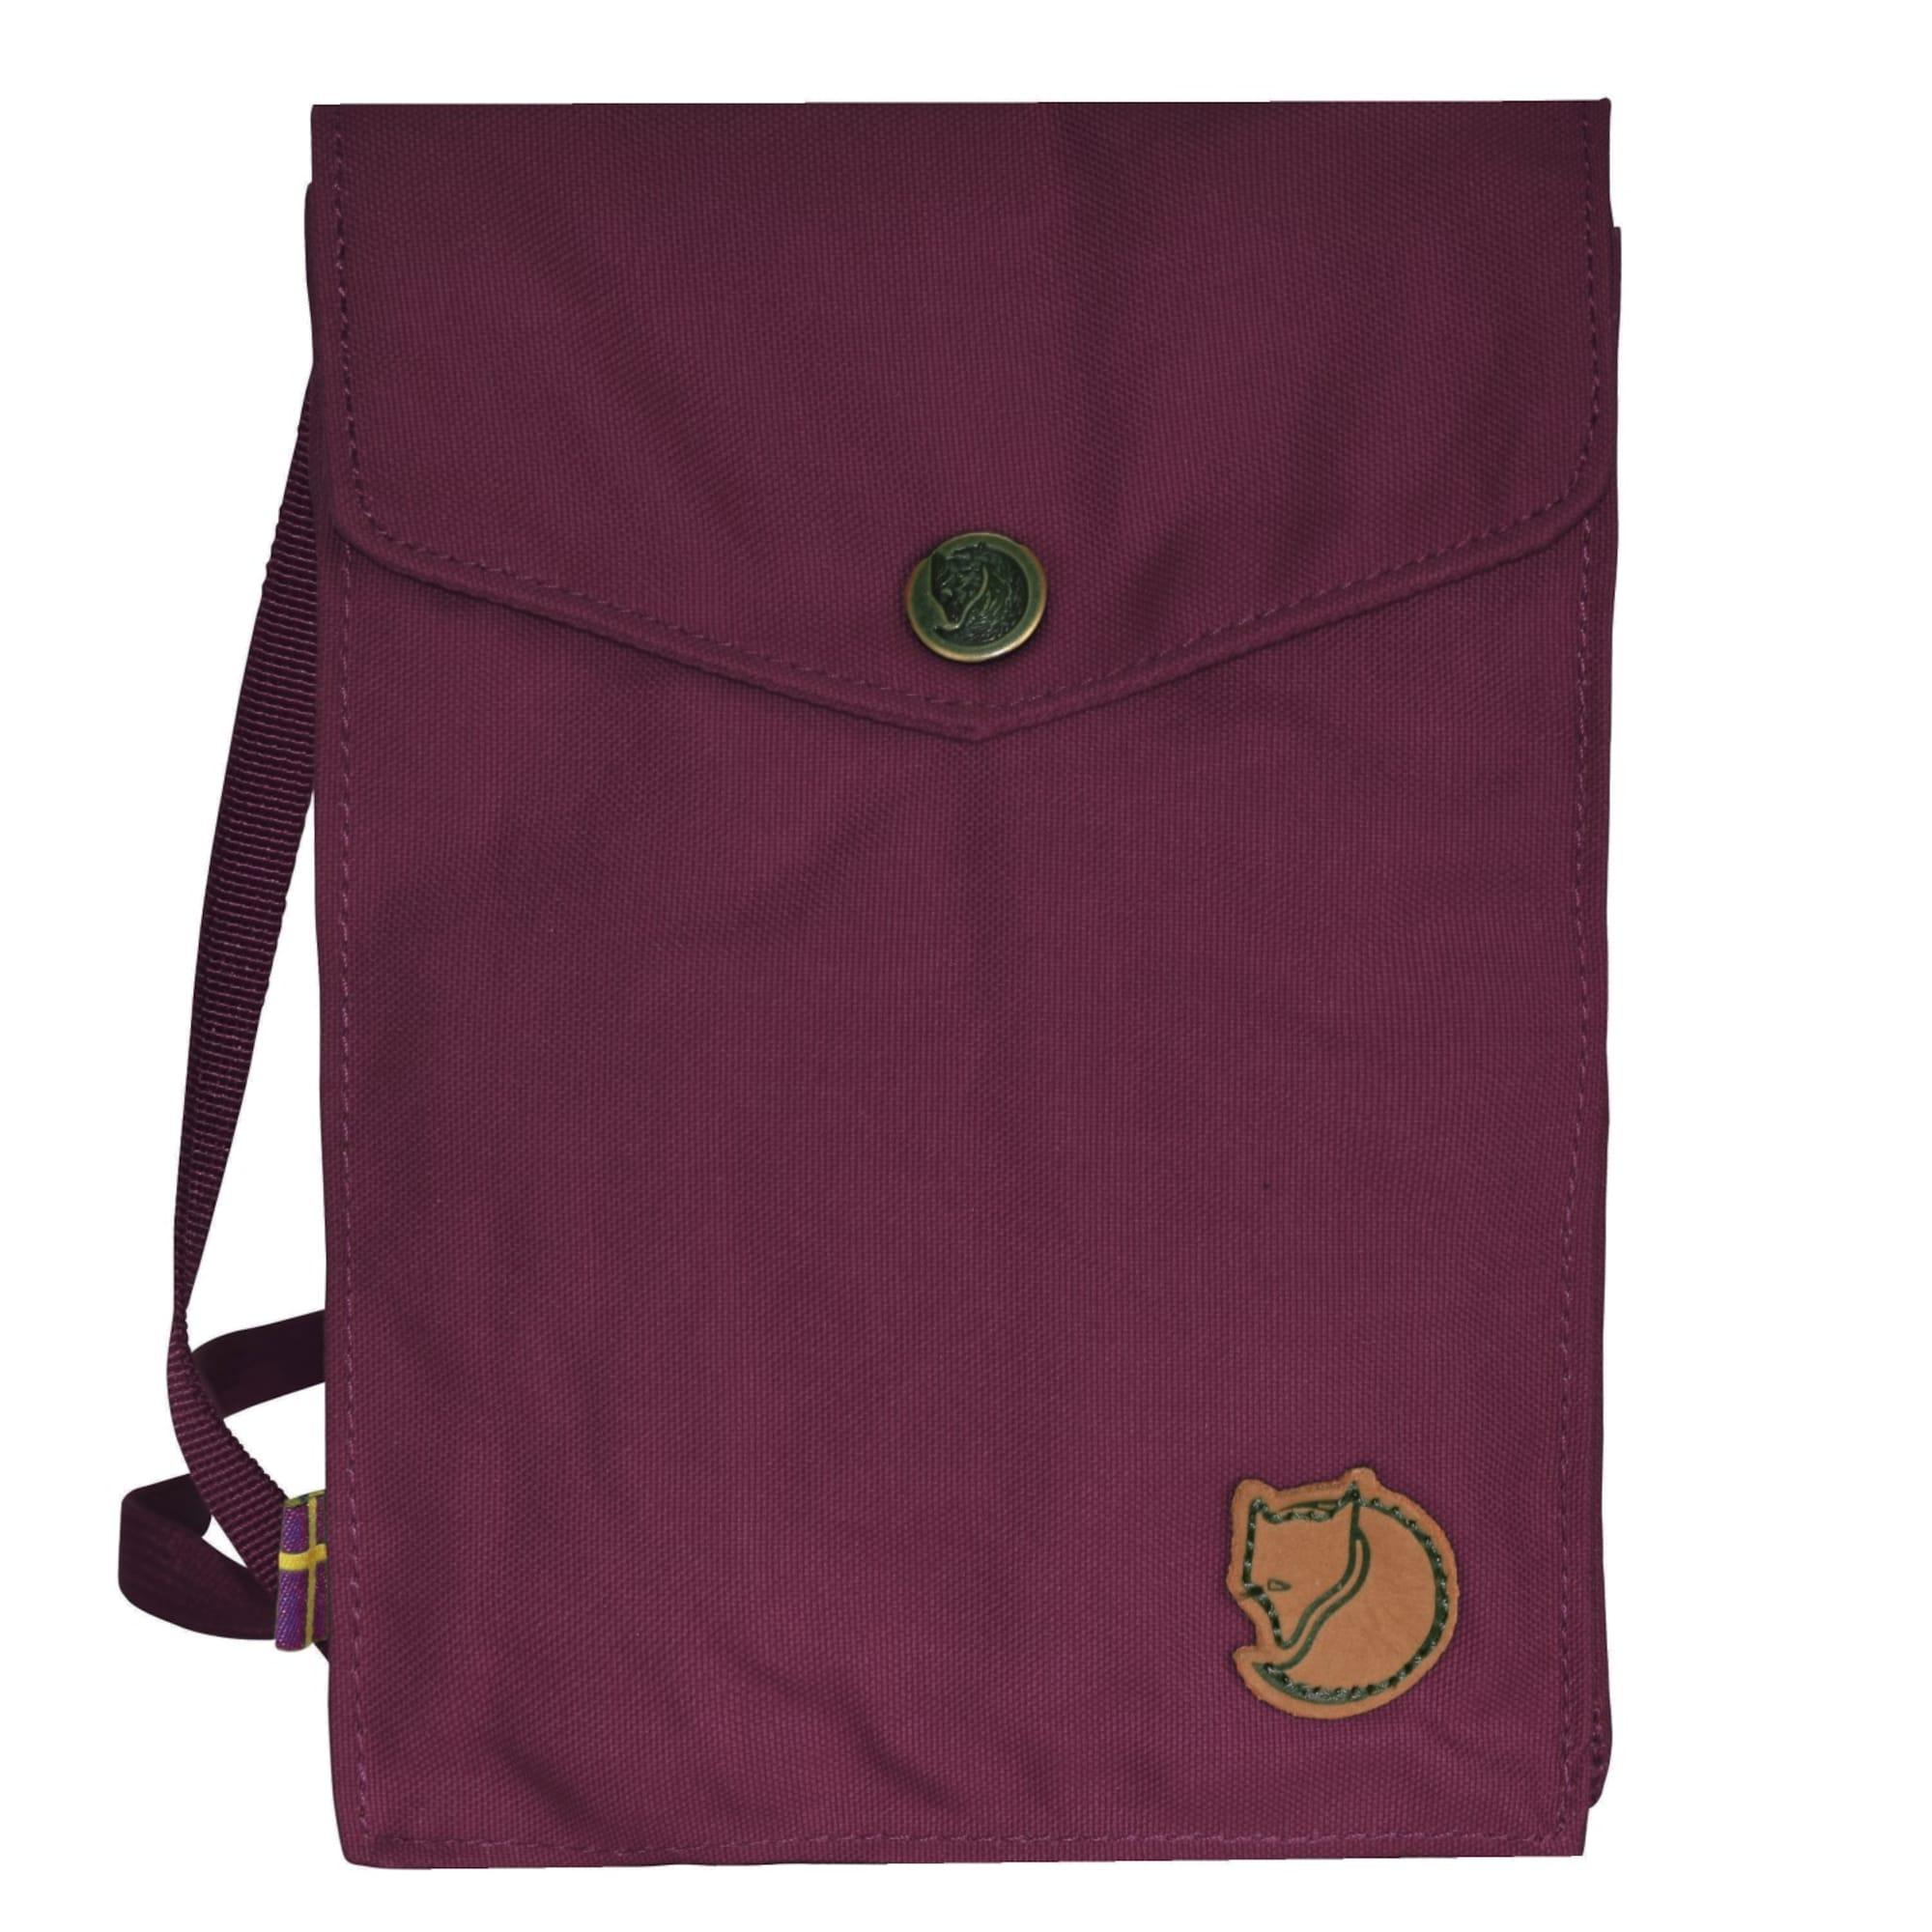 Pocket Brustbeutel | Accessoires > Portemonnaies > Brustbeutel | Fjällräven